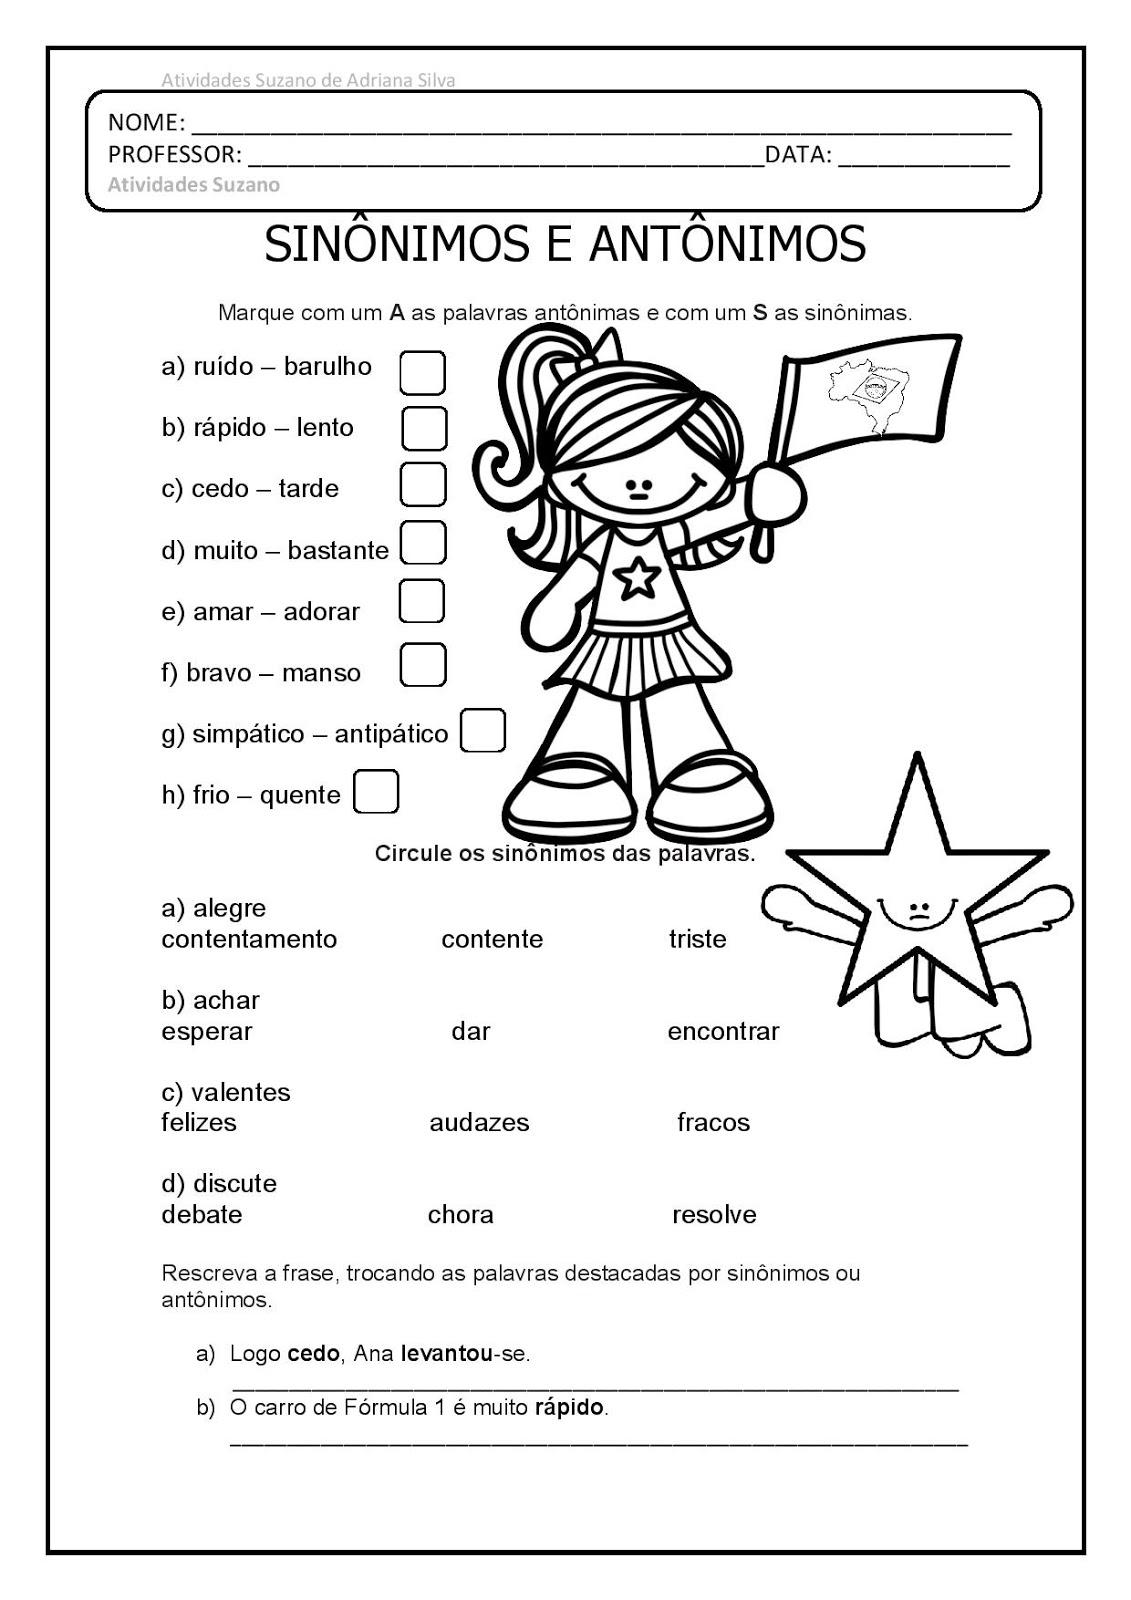 Armario Resina Lavadora Leroy Merlin ~ Sin u00f4nimos e Ant u00f4nimos EM PDF Atividades Pedagogica Suzano